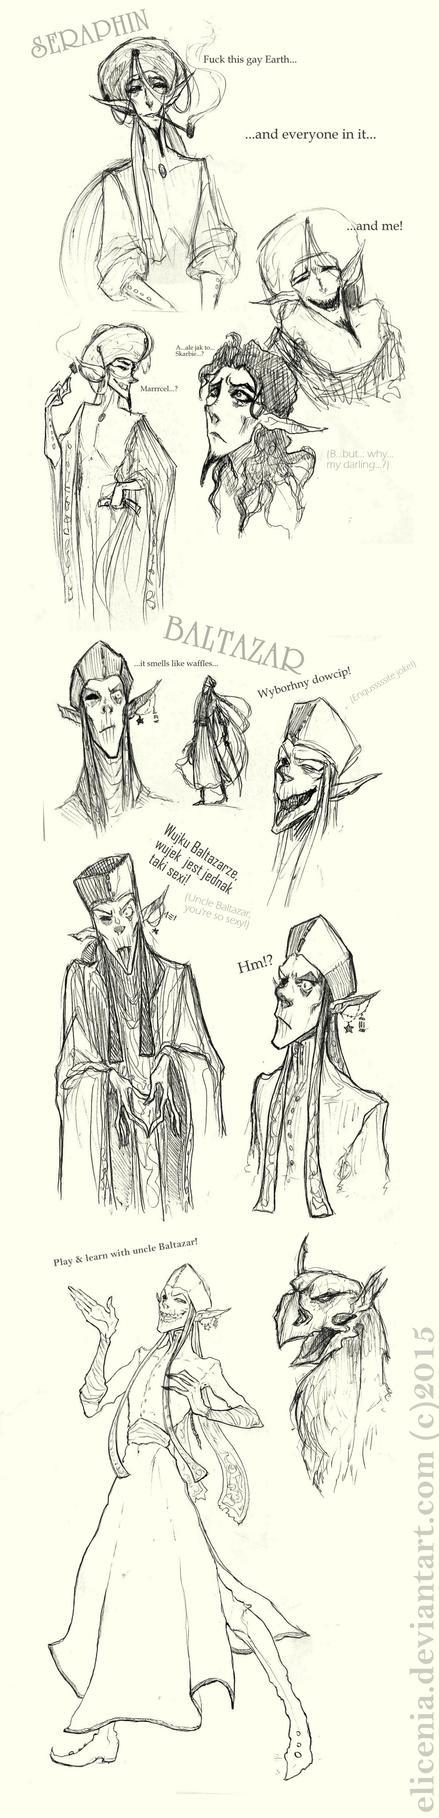 Seraphin and Baltazar sketchdump by elicenia